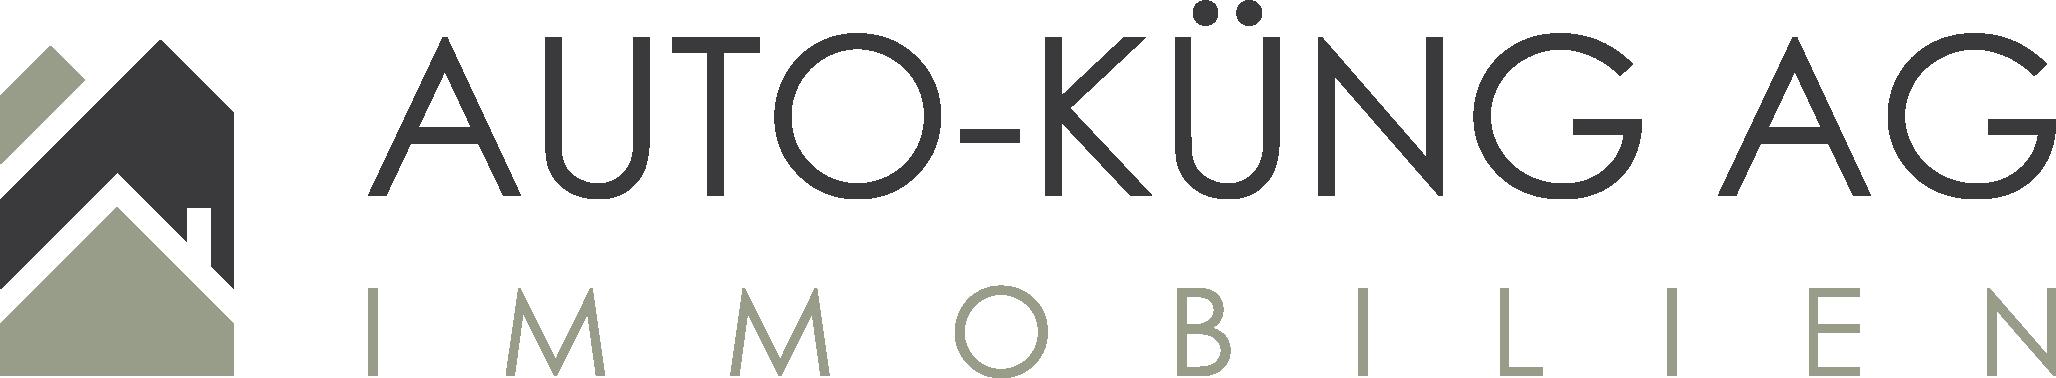 Auto-Küng AG